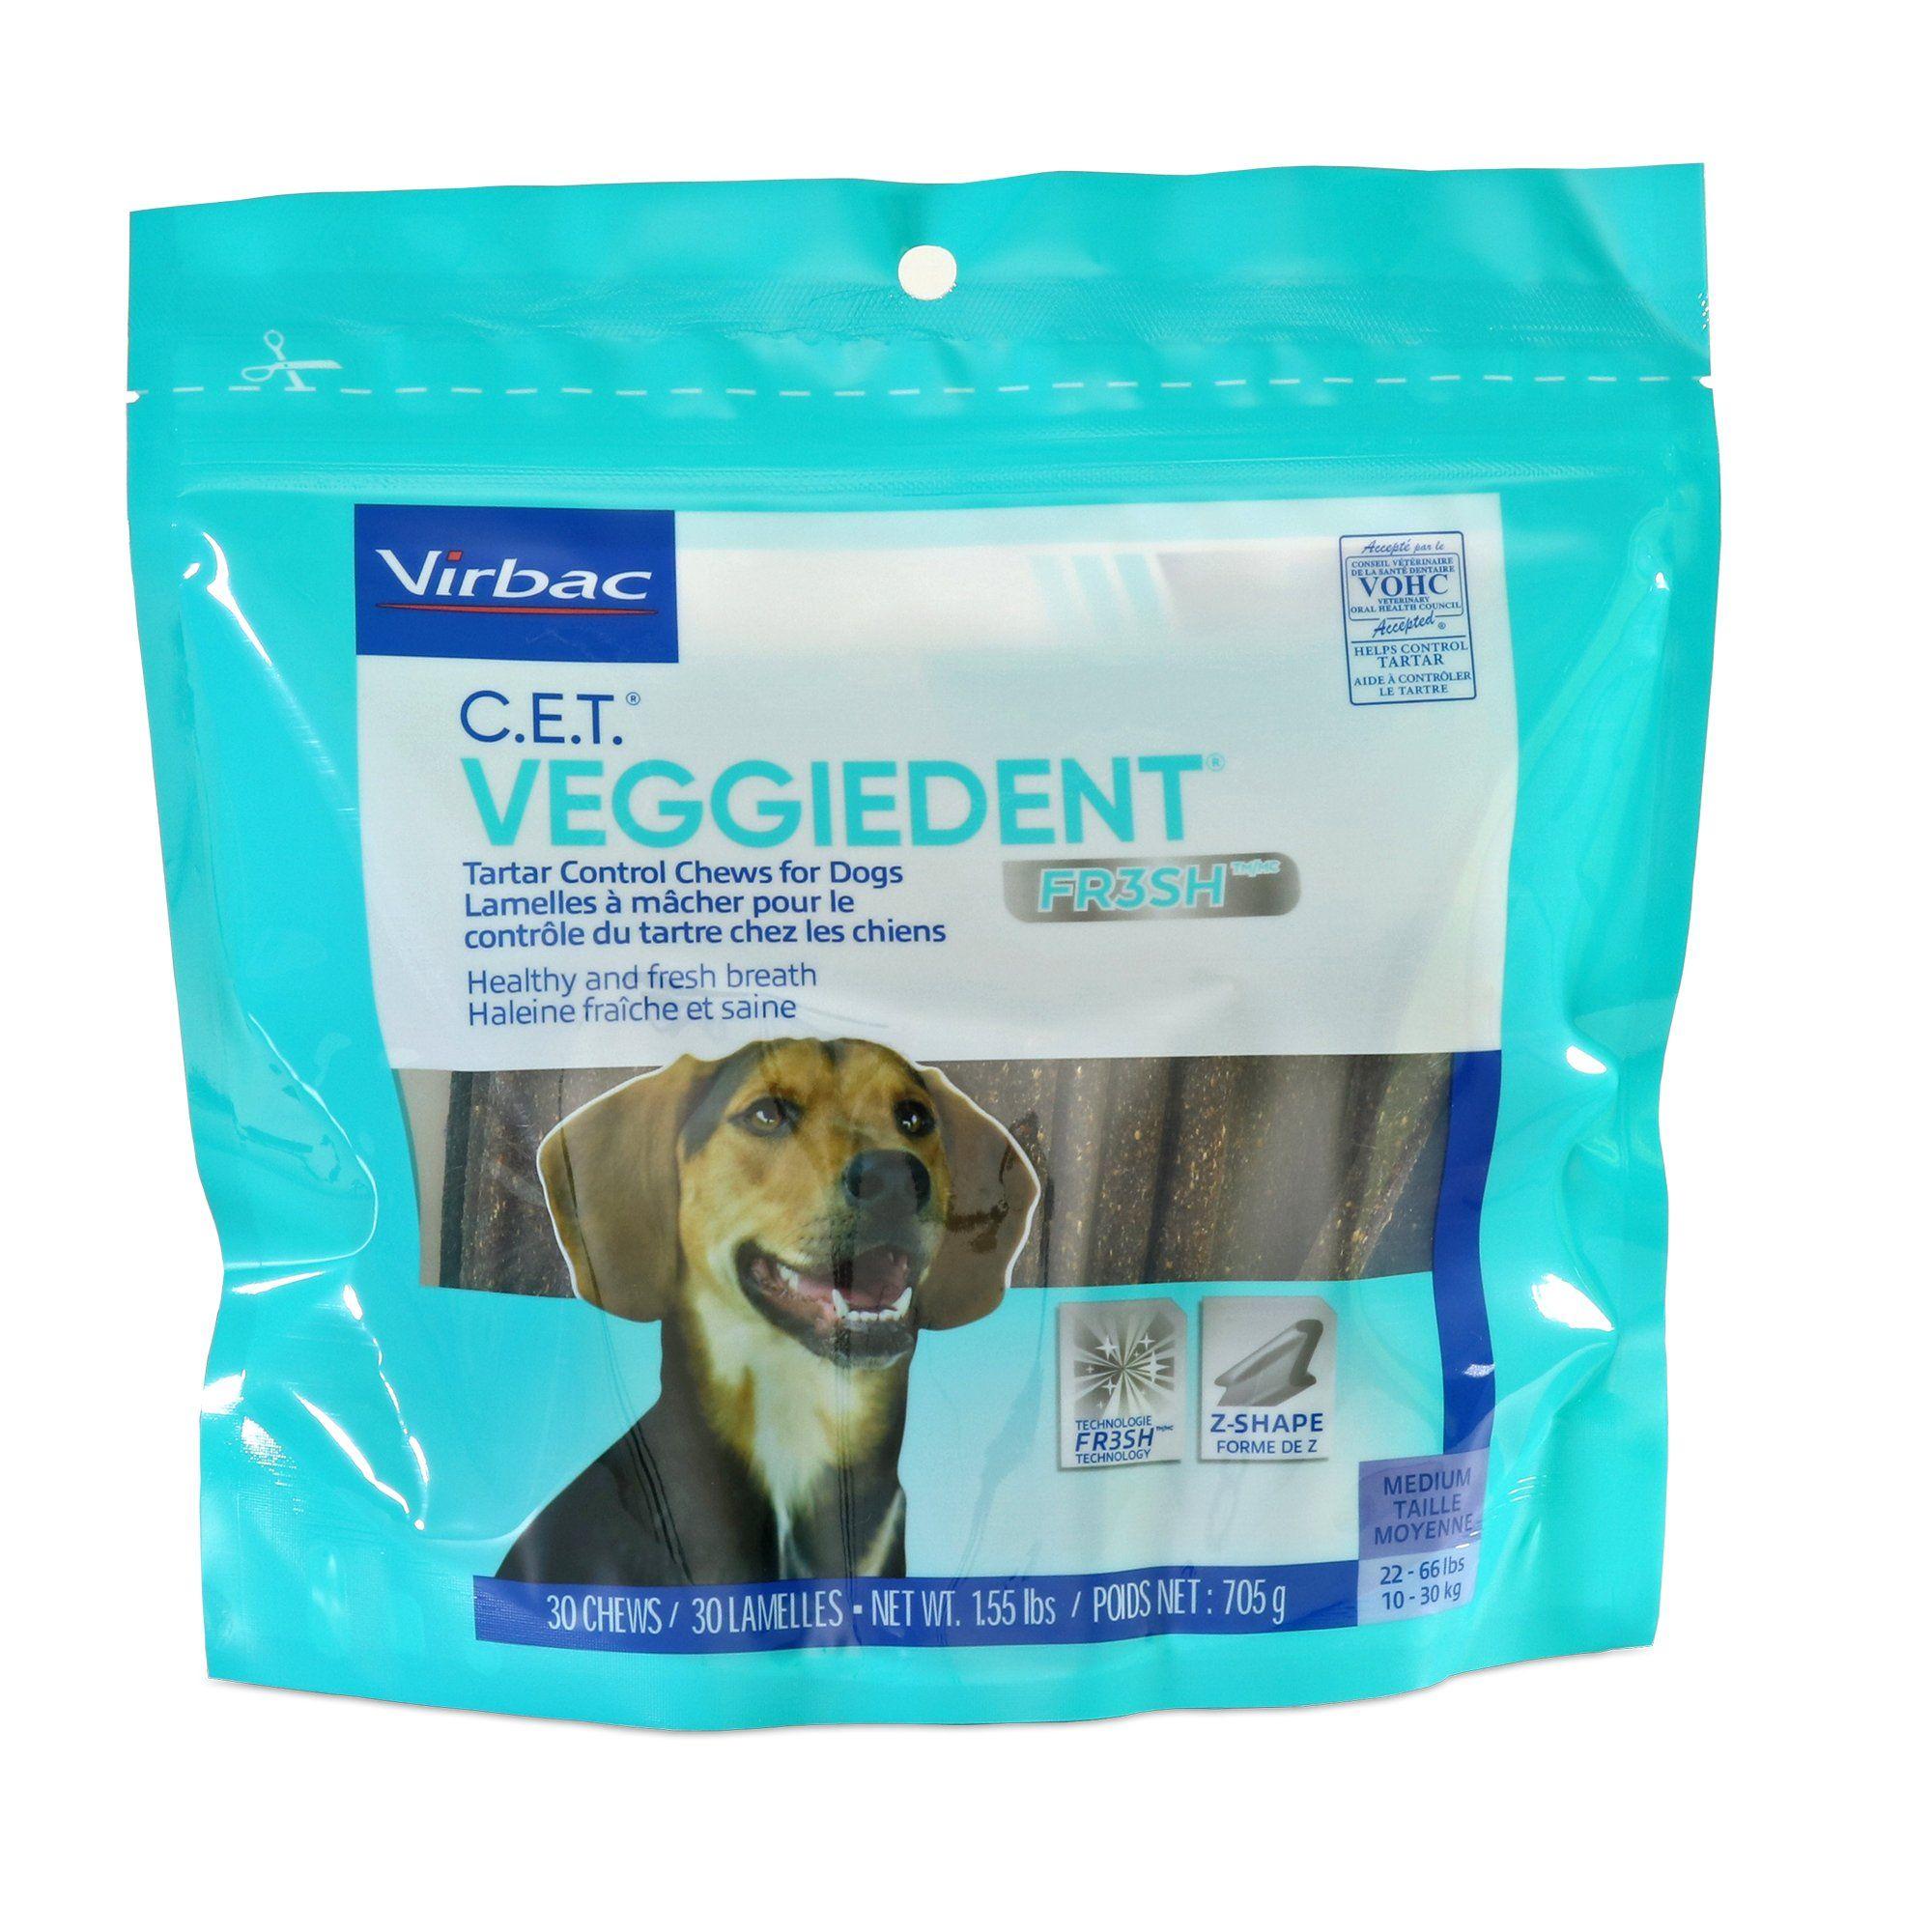 Virbac C E T Veggiedent Fr3sh Chew Dog Treats 1 55 Lbs Count